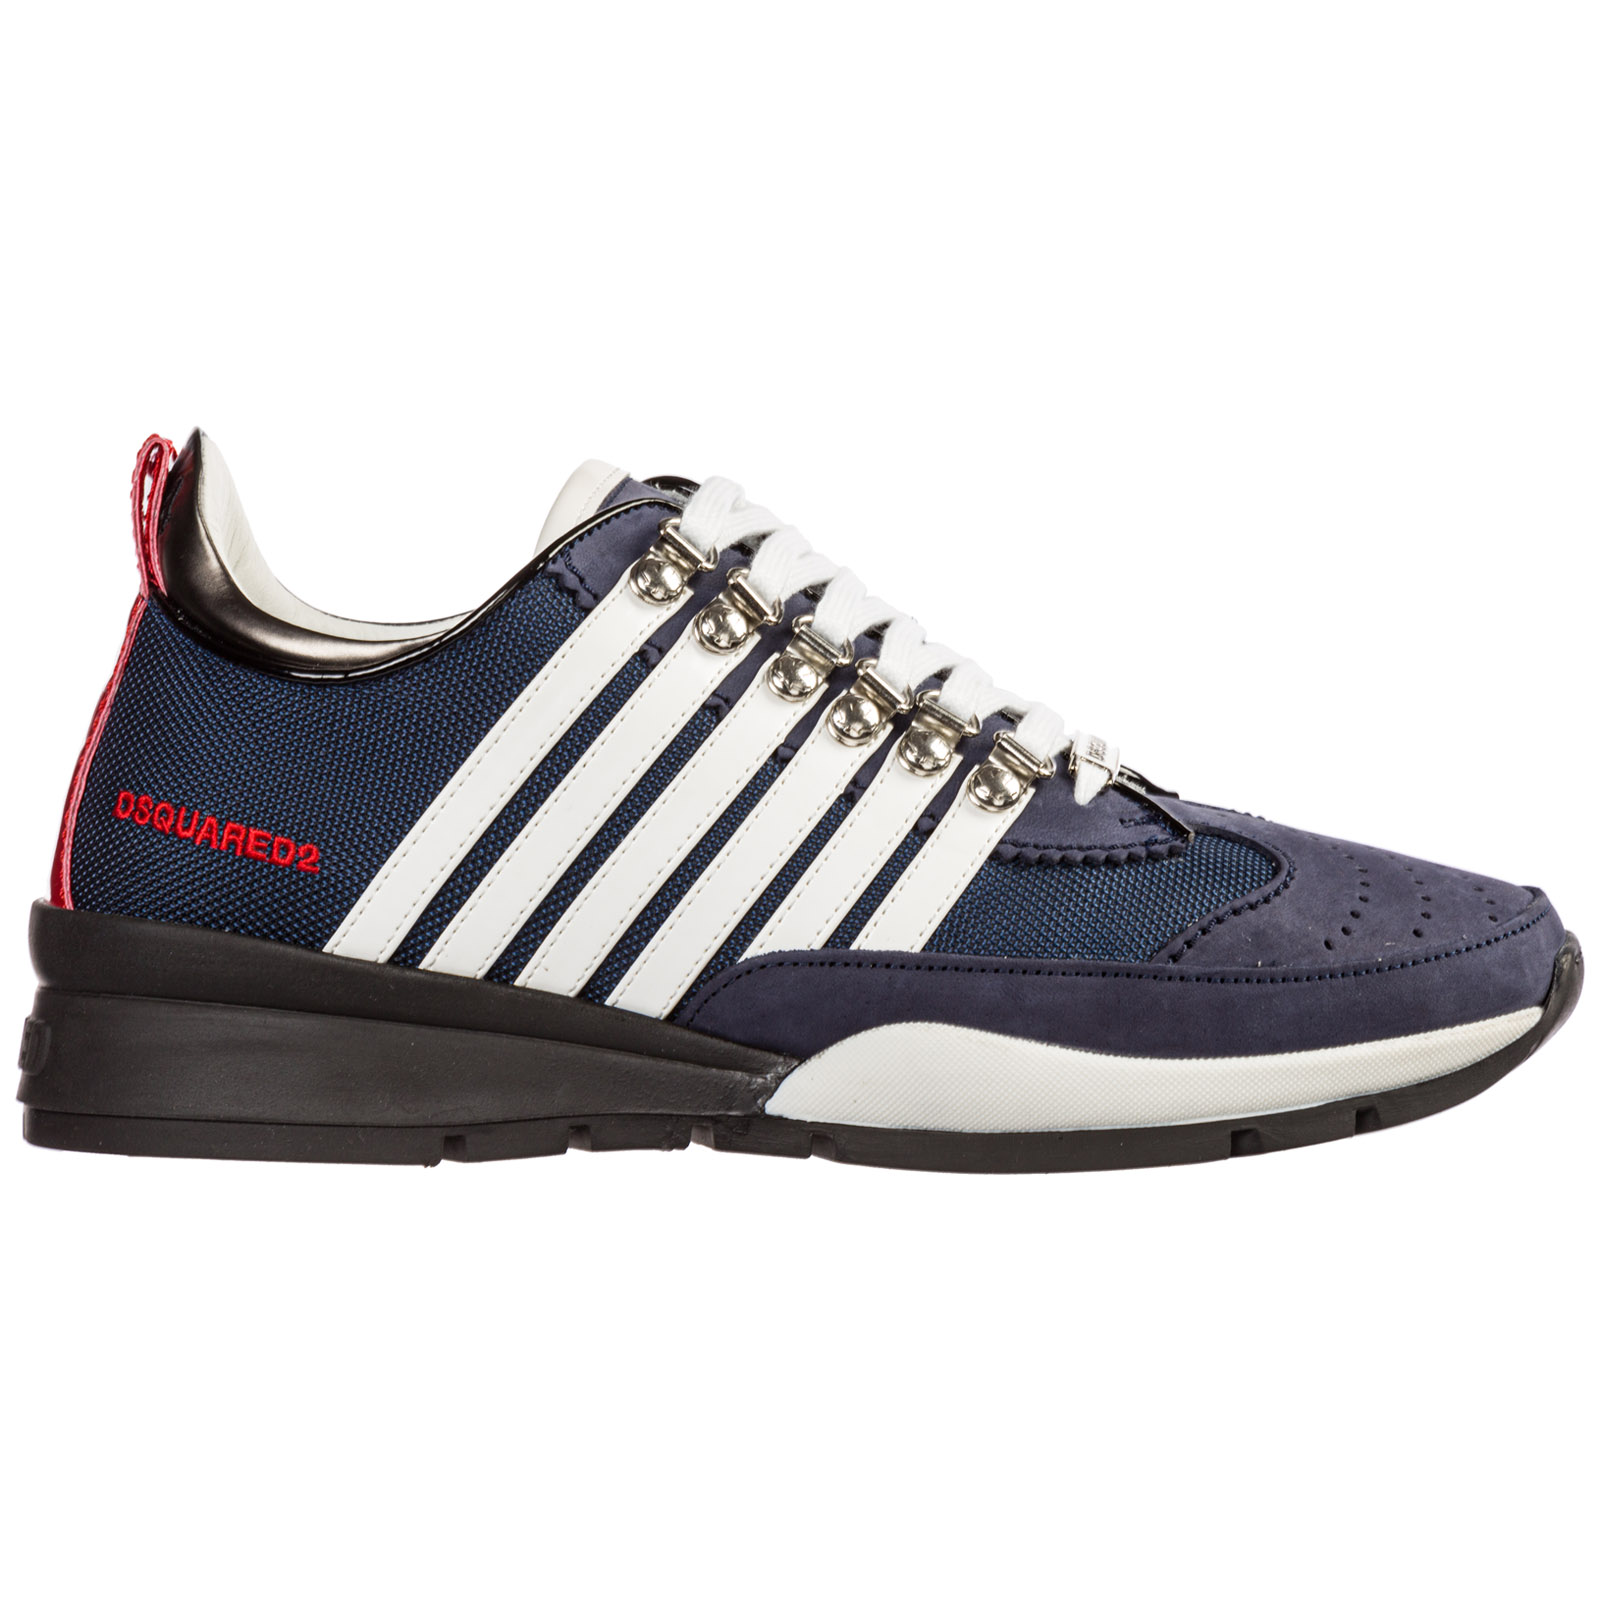 20c9824d8f Scarpe sneakers uomo in pelle